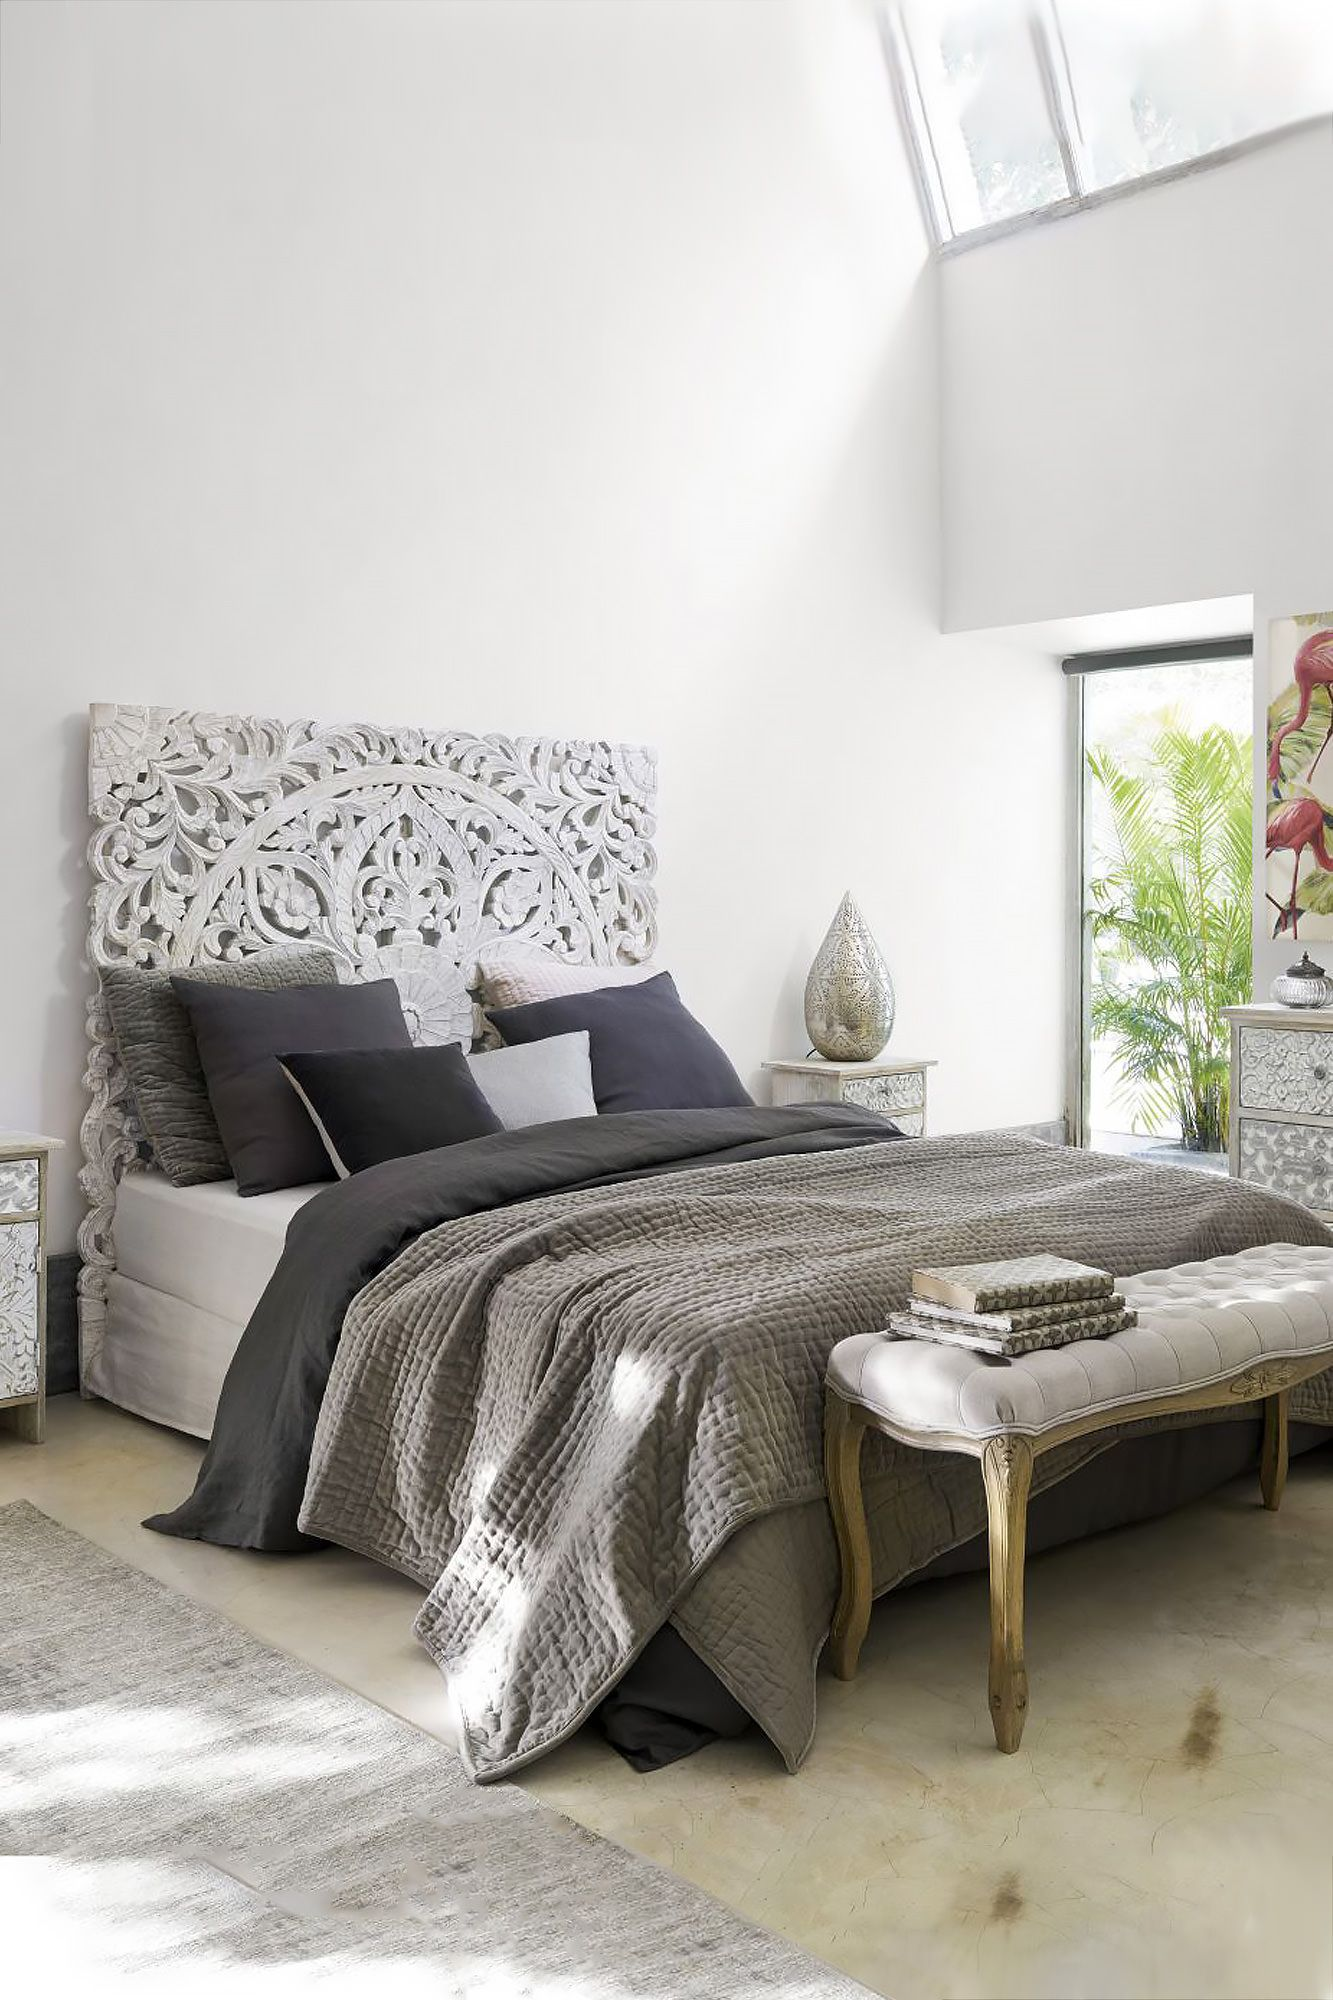 Queen Headboard Beach Cottage Bed Decoration Bed Decor Bedroom